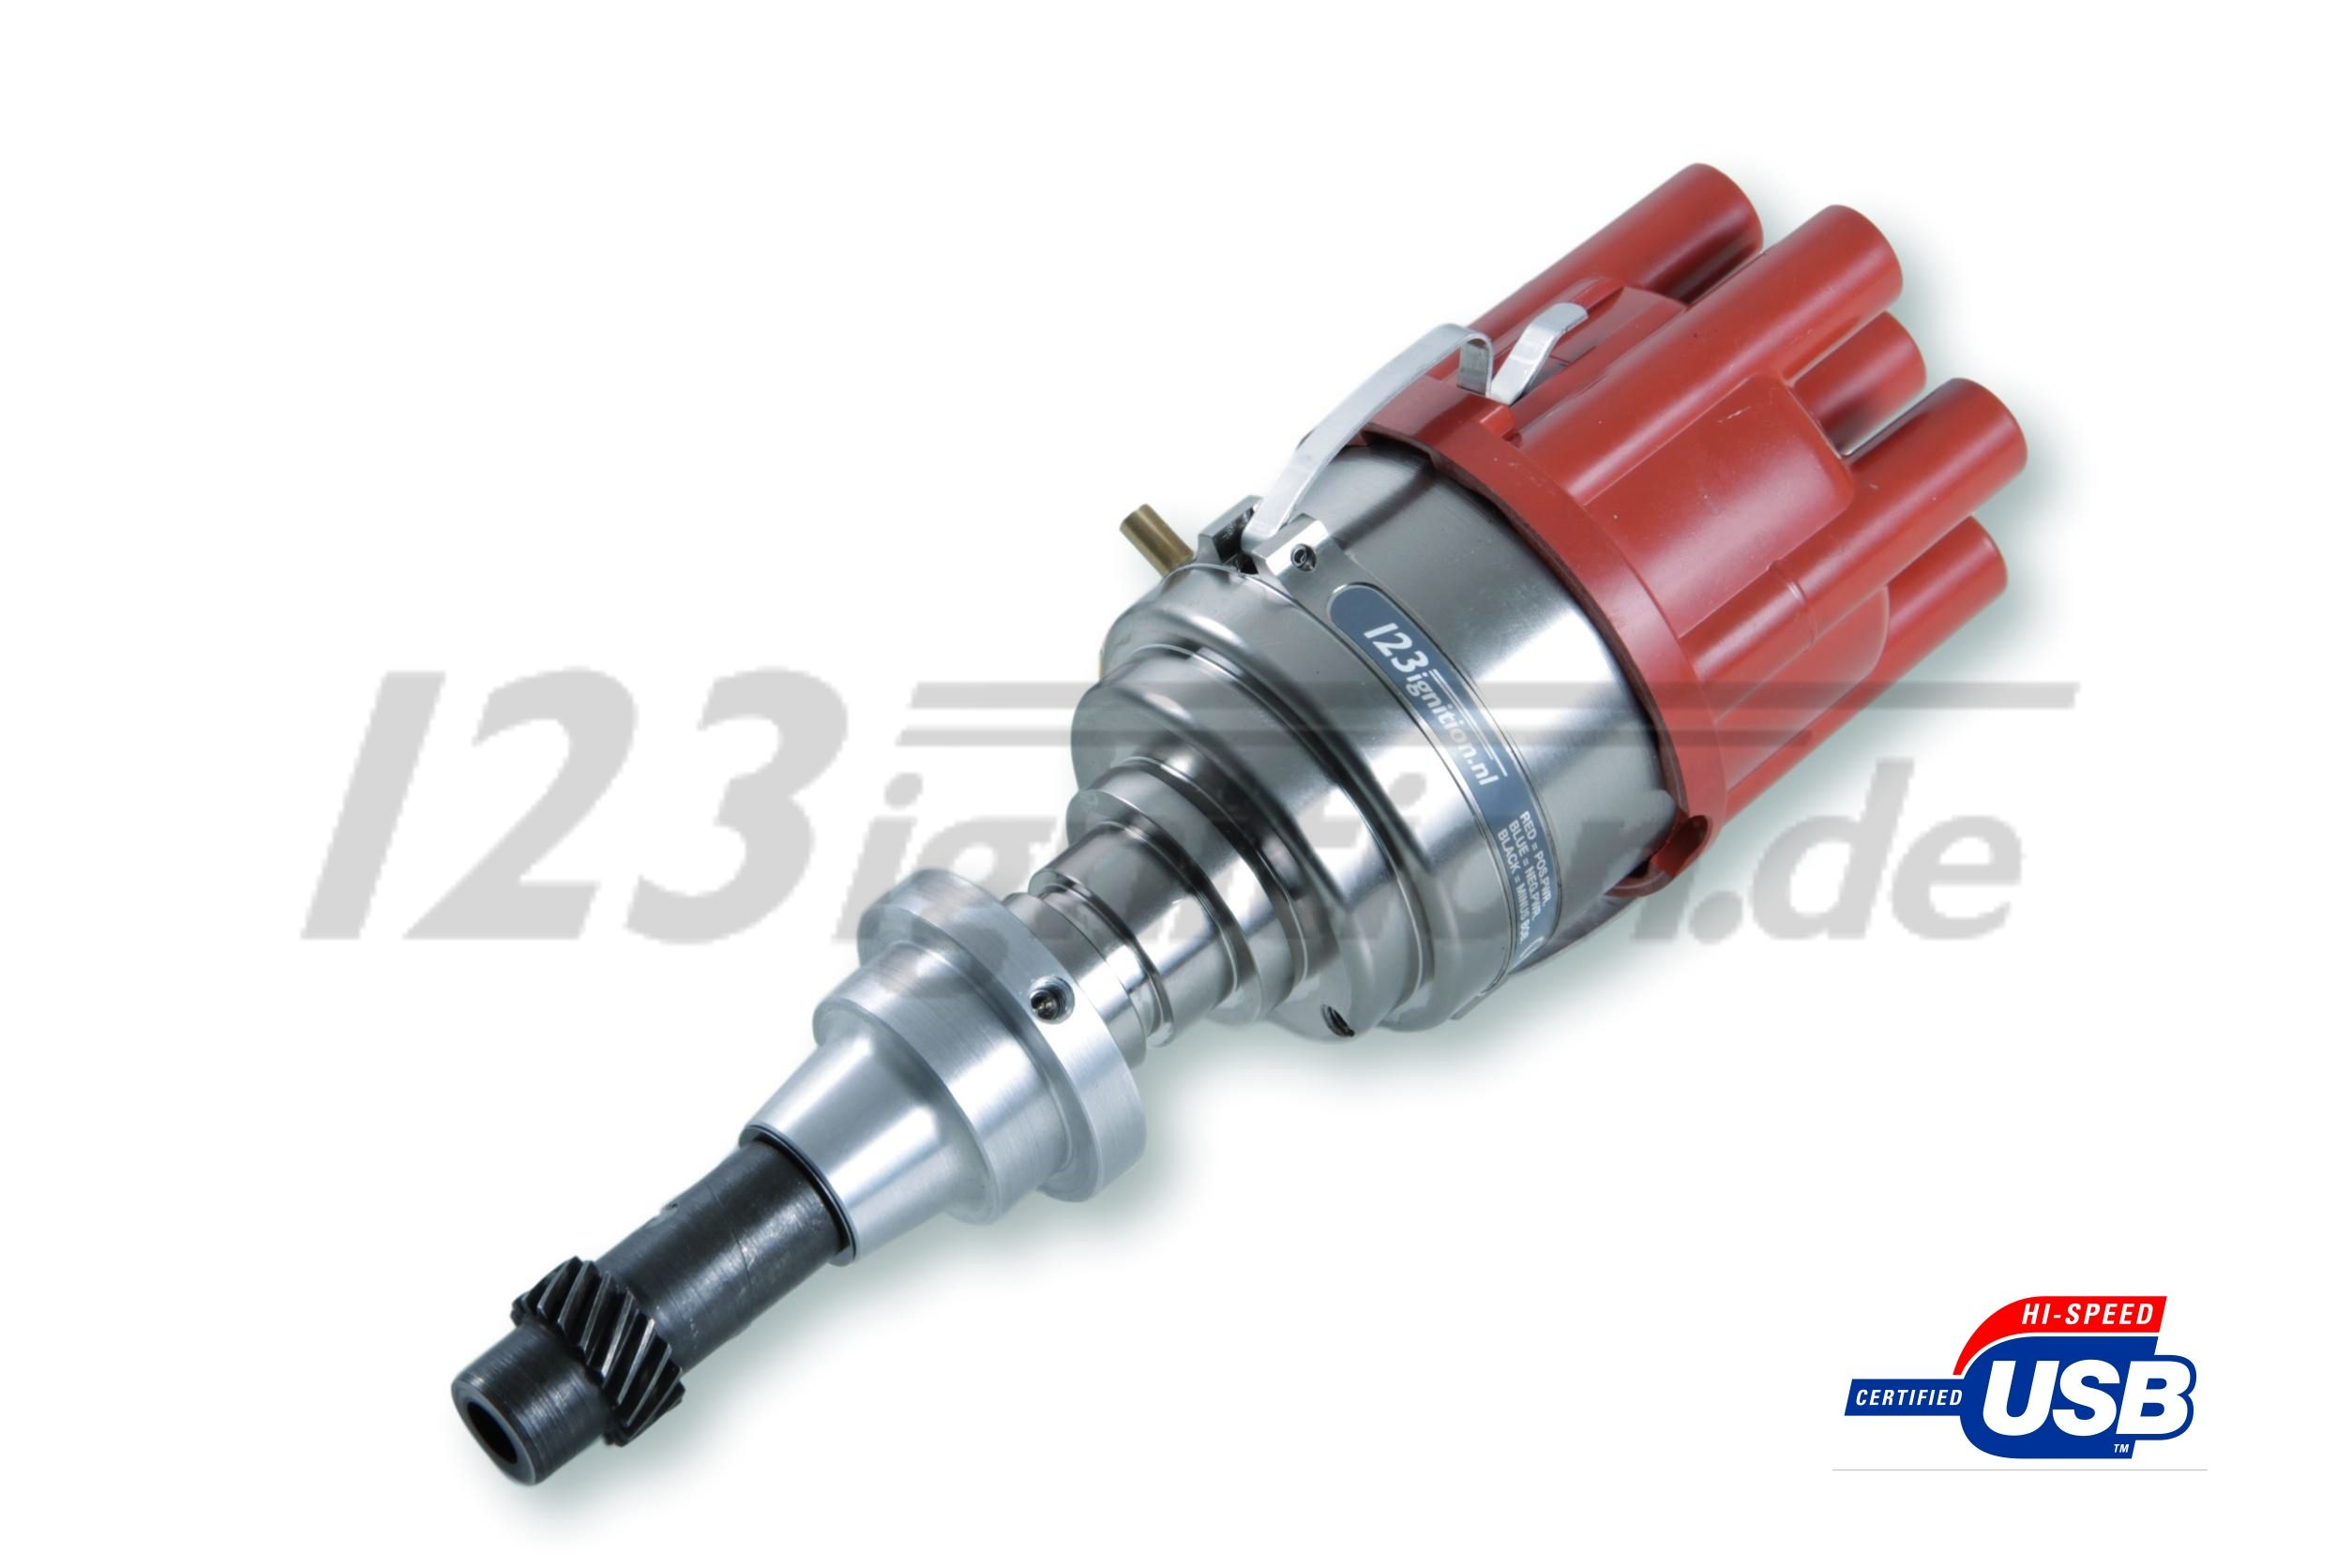 123\TUNE USB ontsteking verdeler voor VW LT Kleintransporter DL Motor